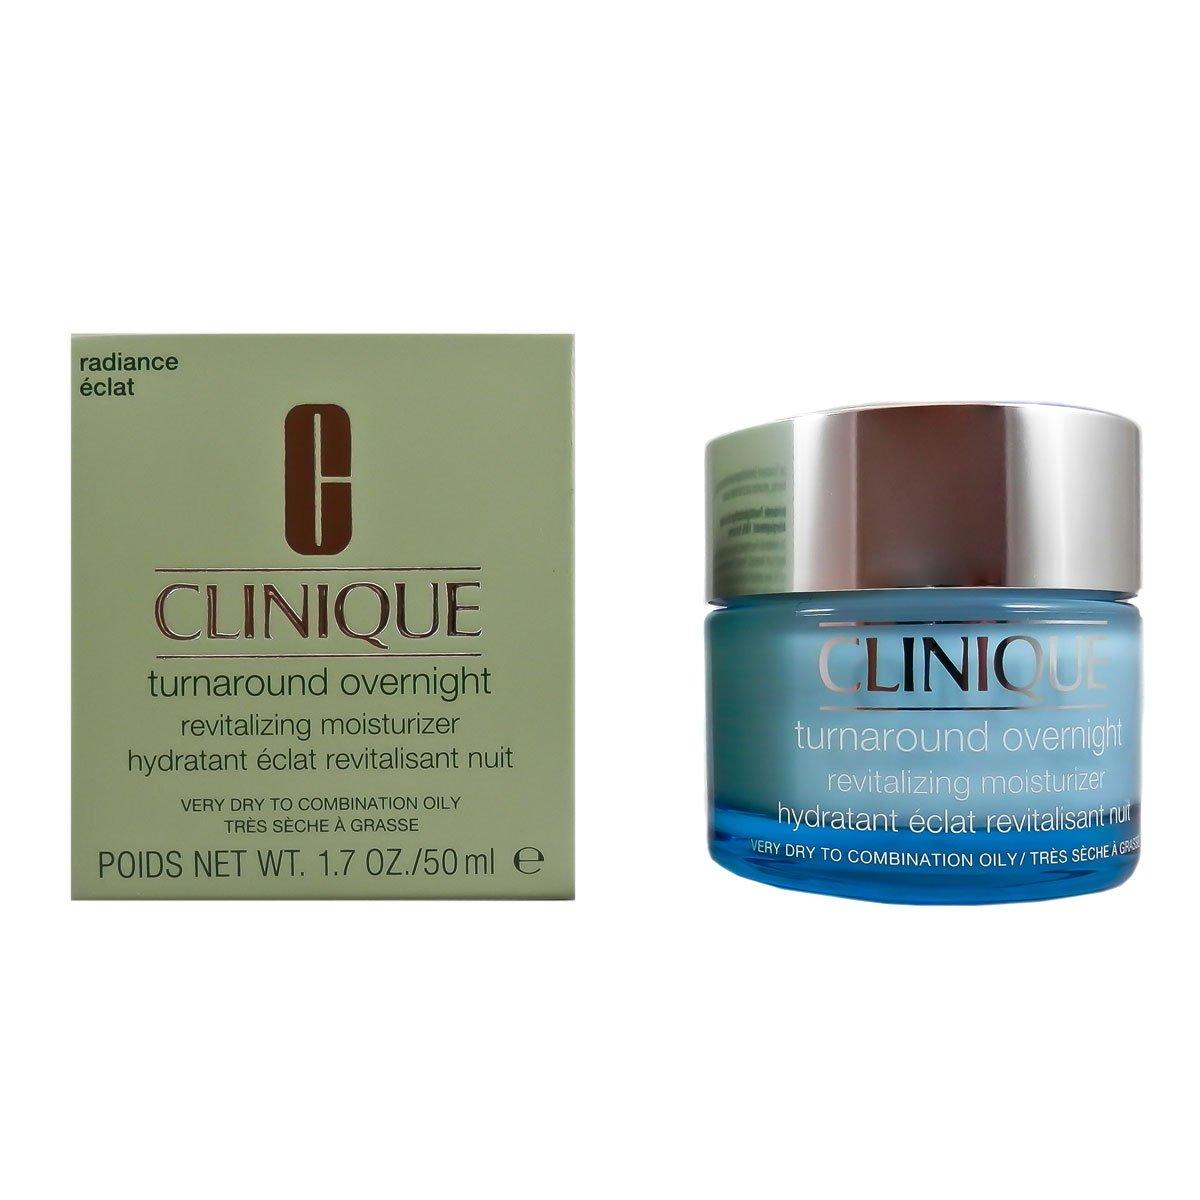 Clinique Night Moisturizer Turnaround Overnight Revitalizing Moisturizer 0020714732202 CLI00054_-50